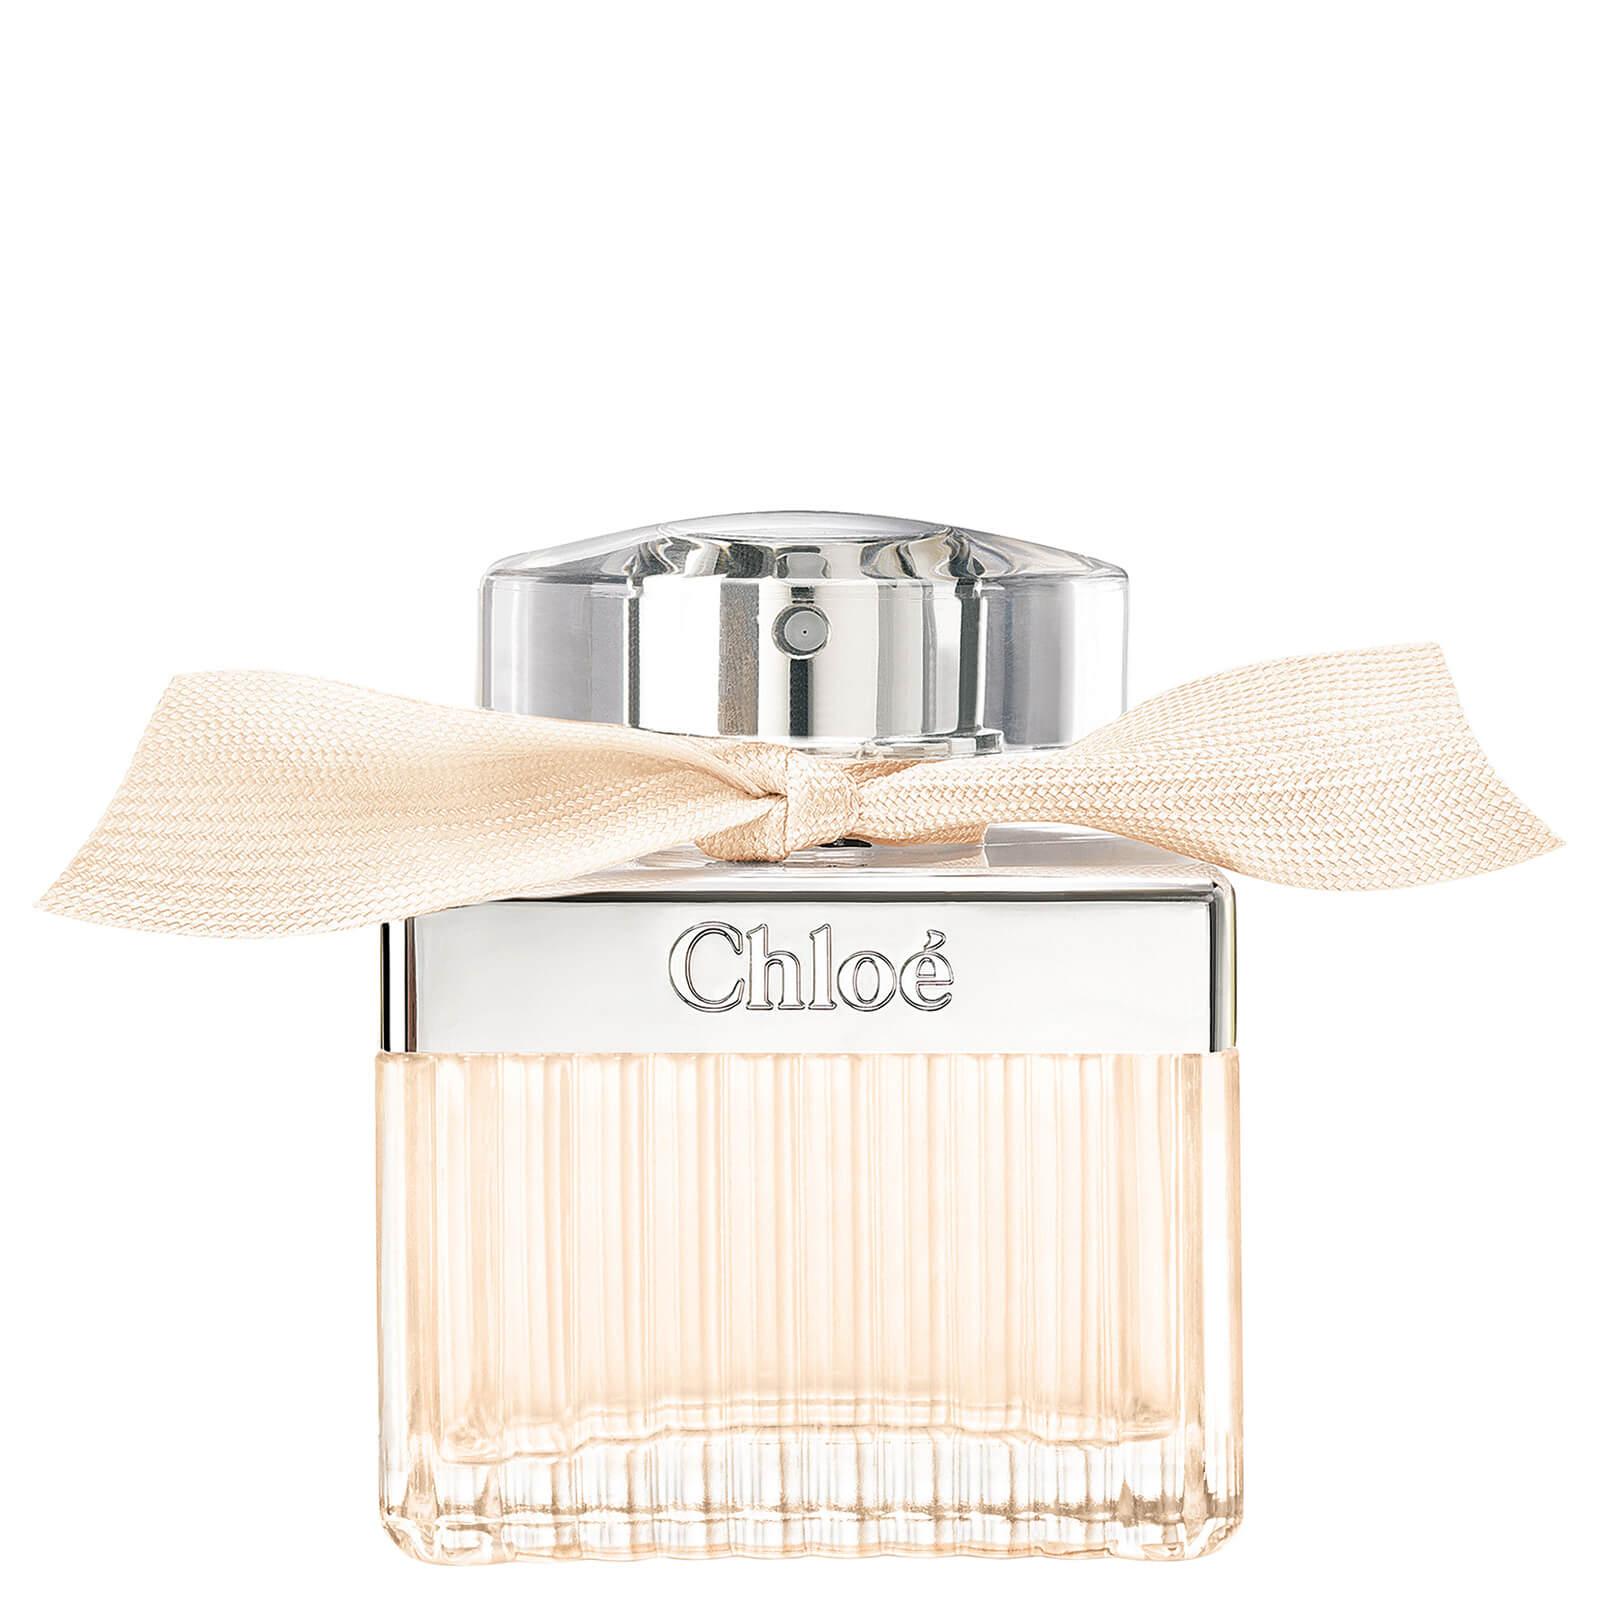 Chloé Fleur De Parfum Edp 50ml Free Shipping Lookfantastic